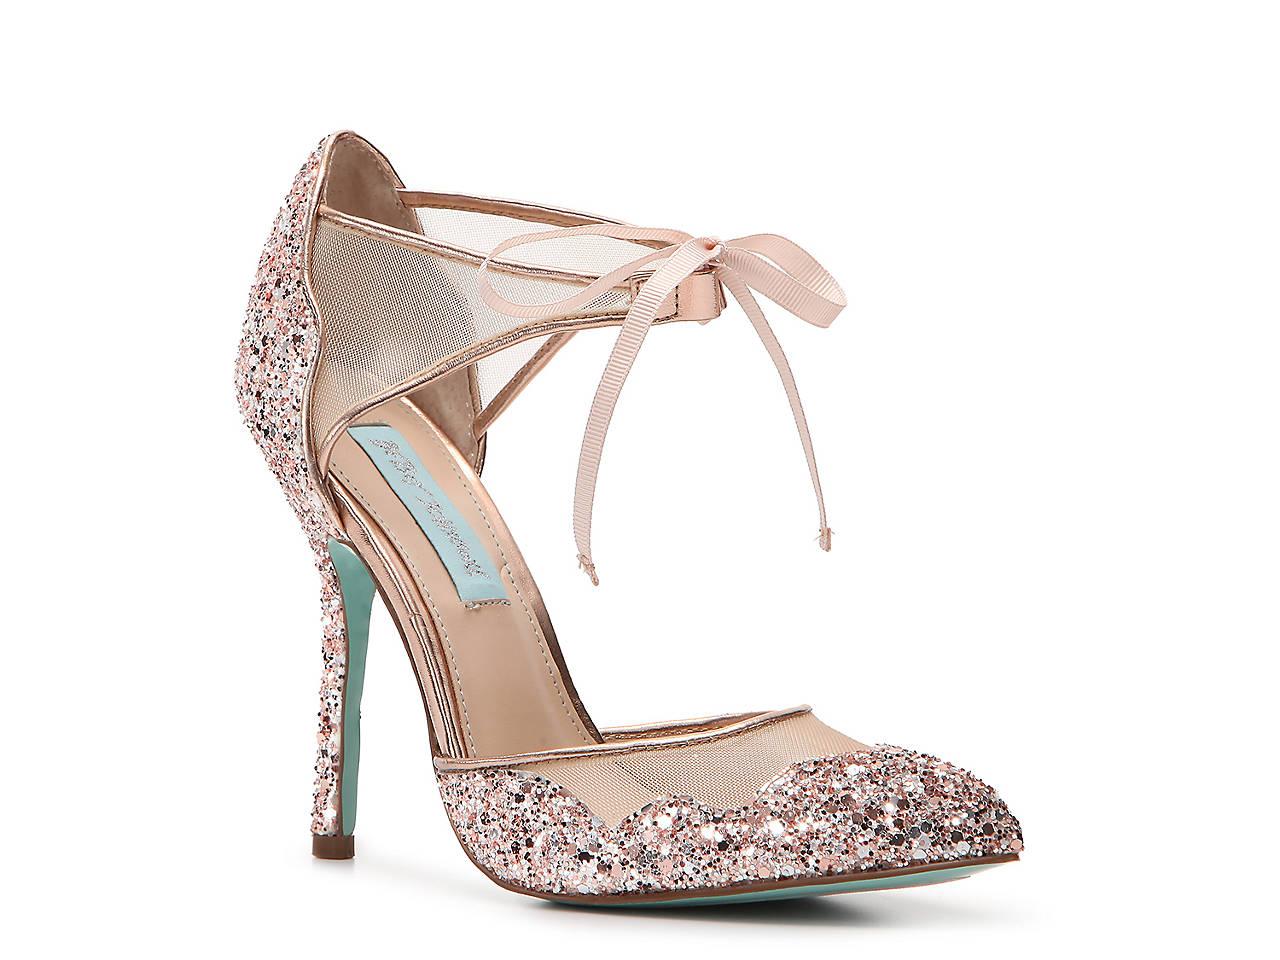 7d0cb5e098b Betsey Johnson Bella Pump Women s Shoes